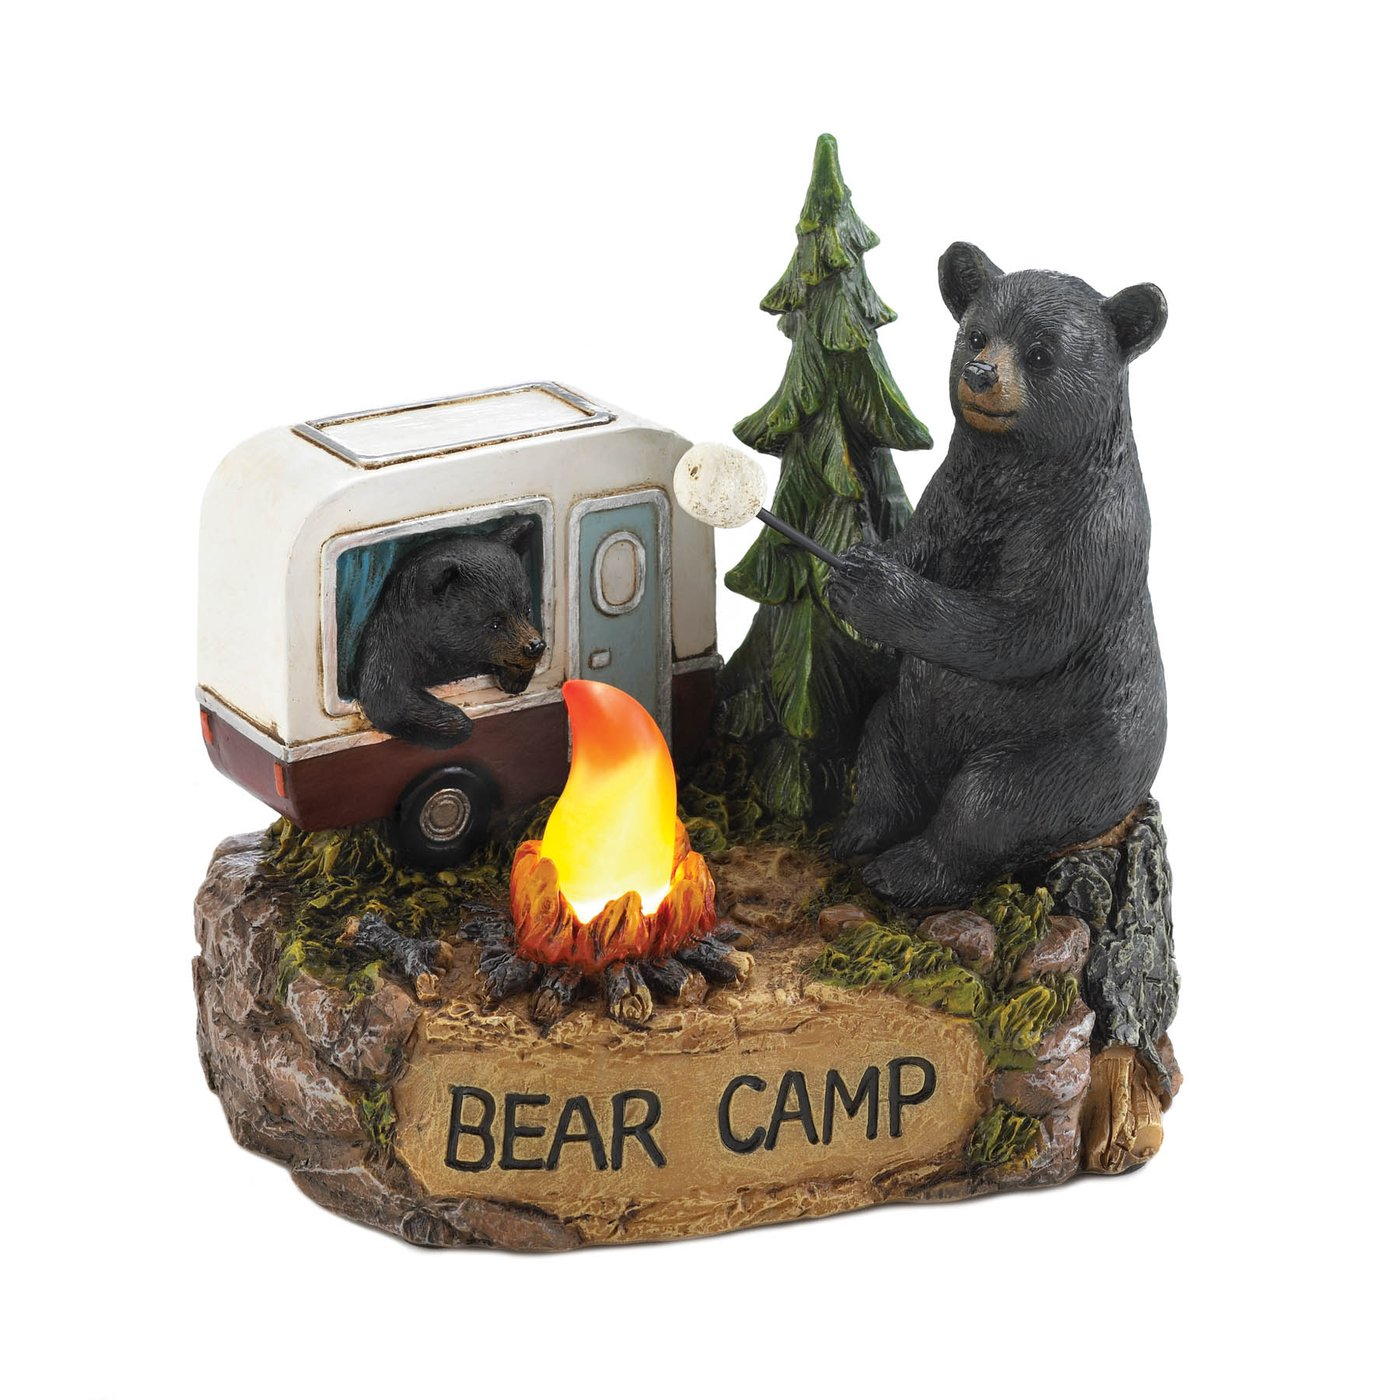 Bear Camp Light-Up FIGURINE